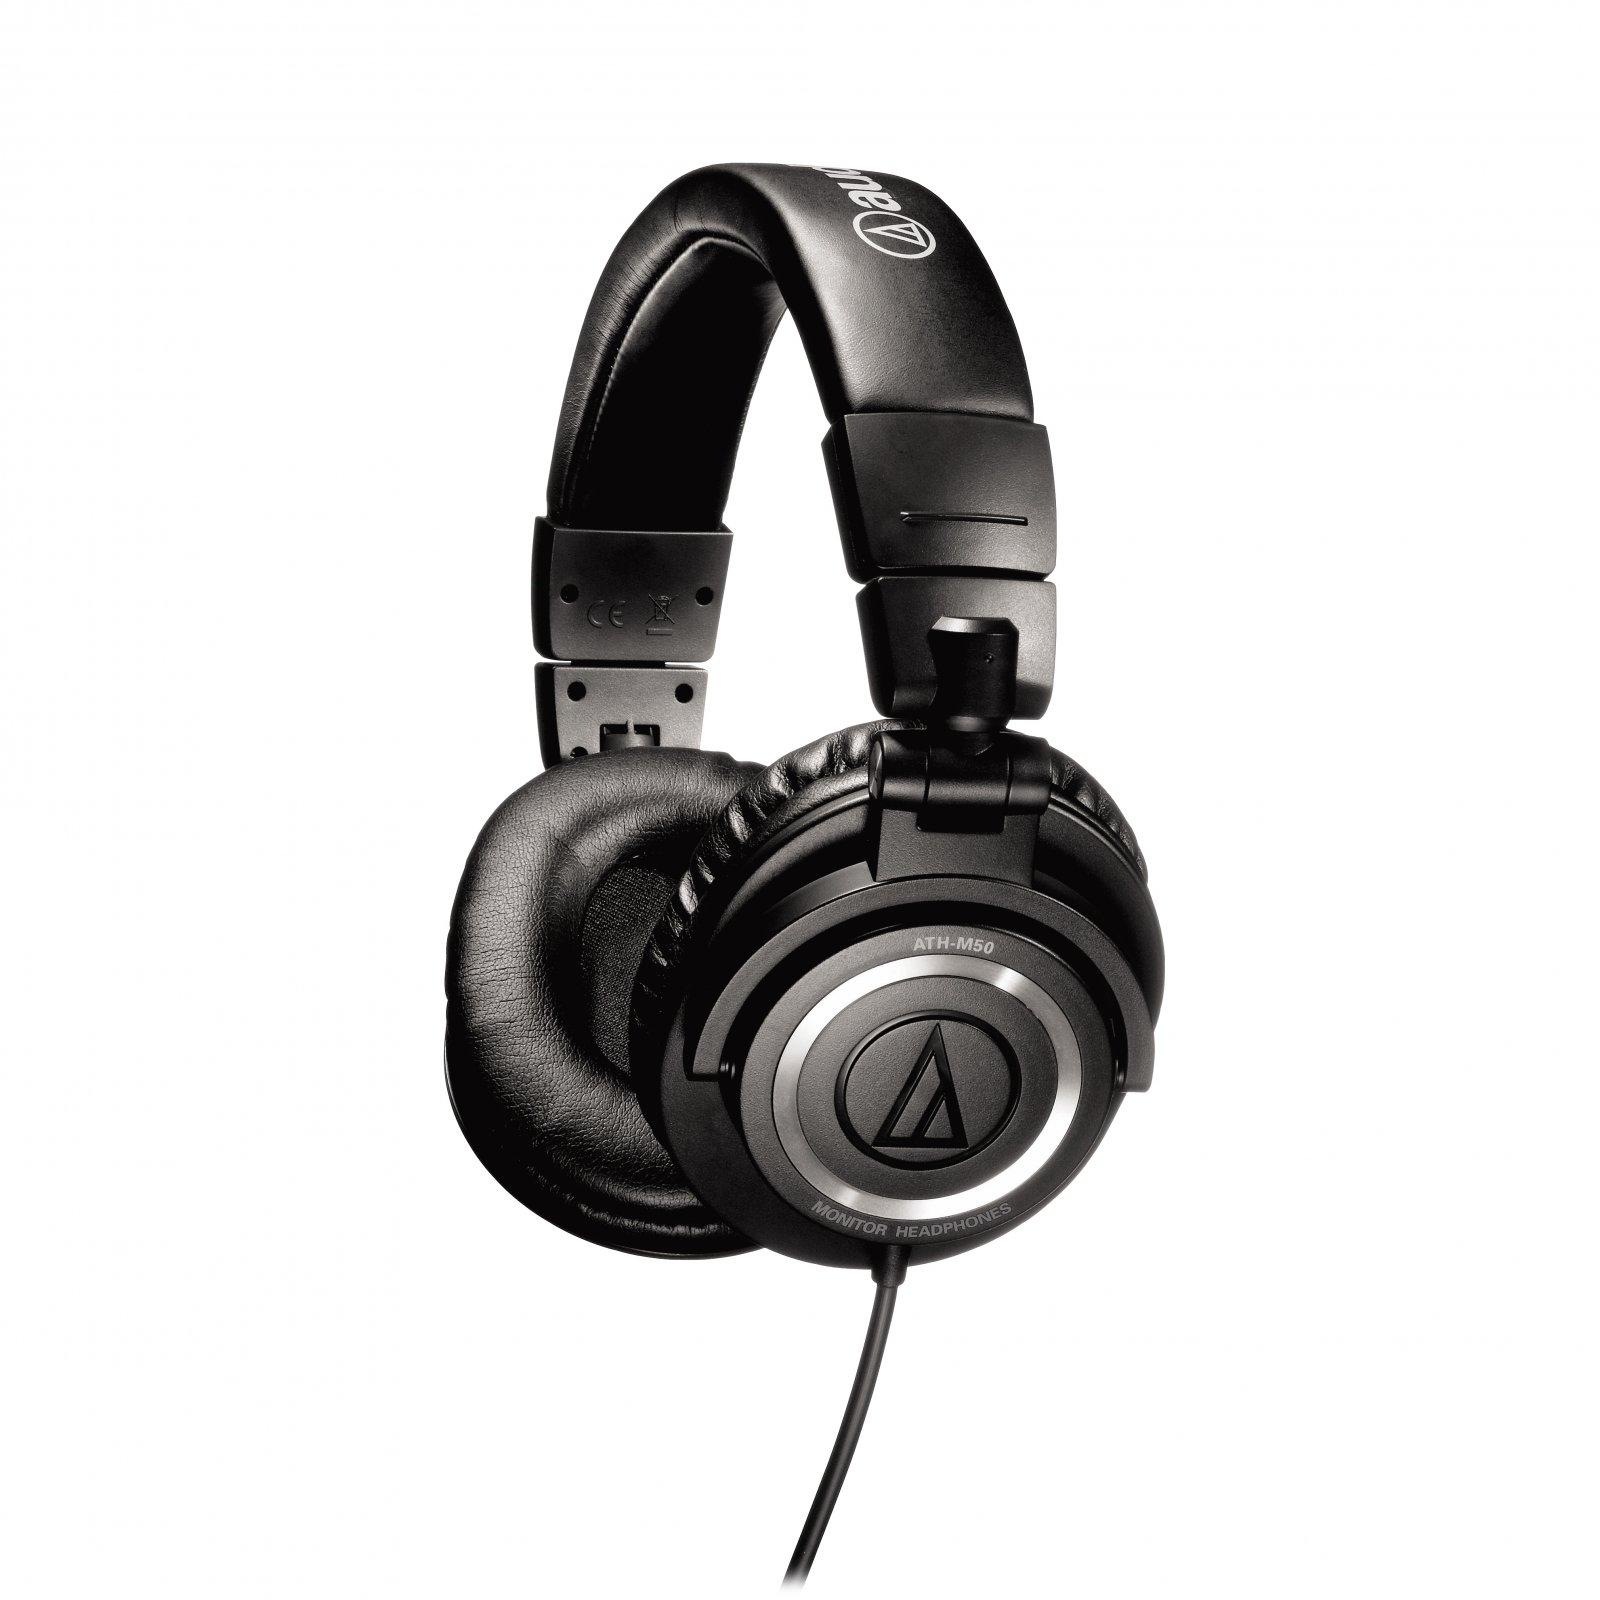 ATH-M50 Studio Headphones